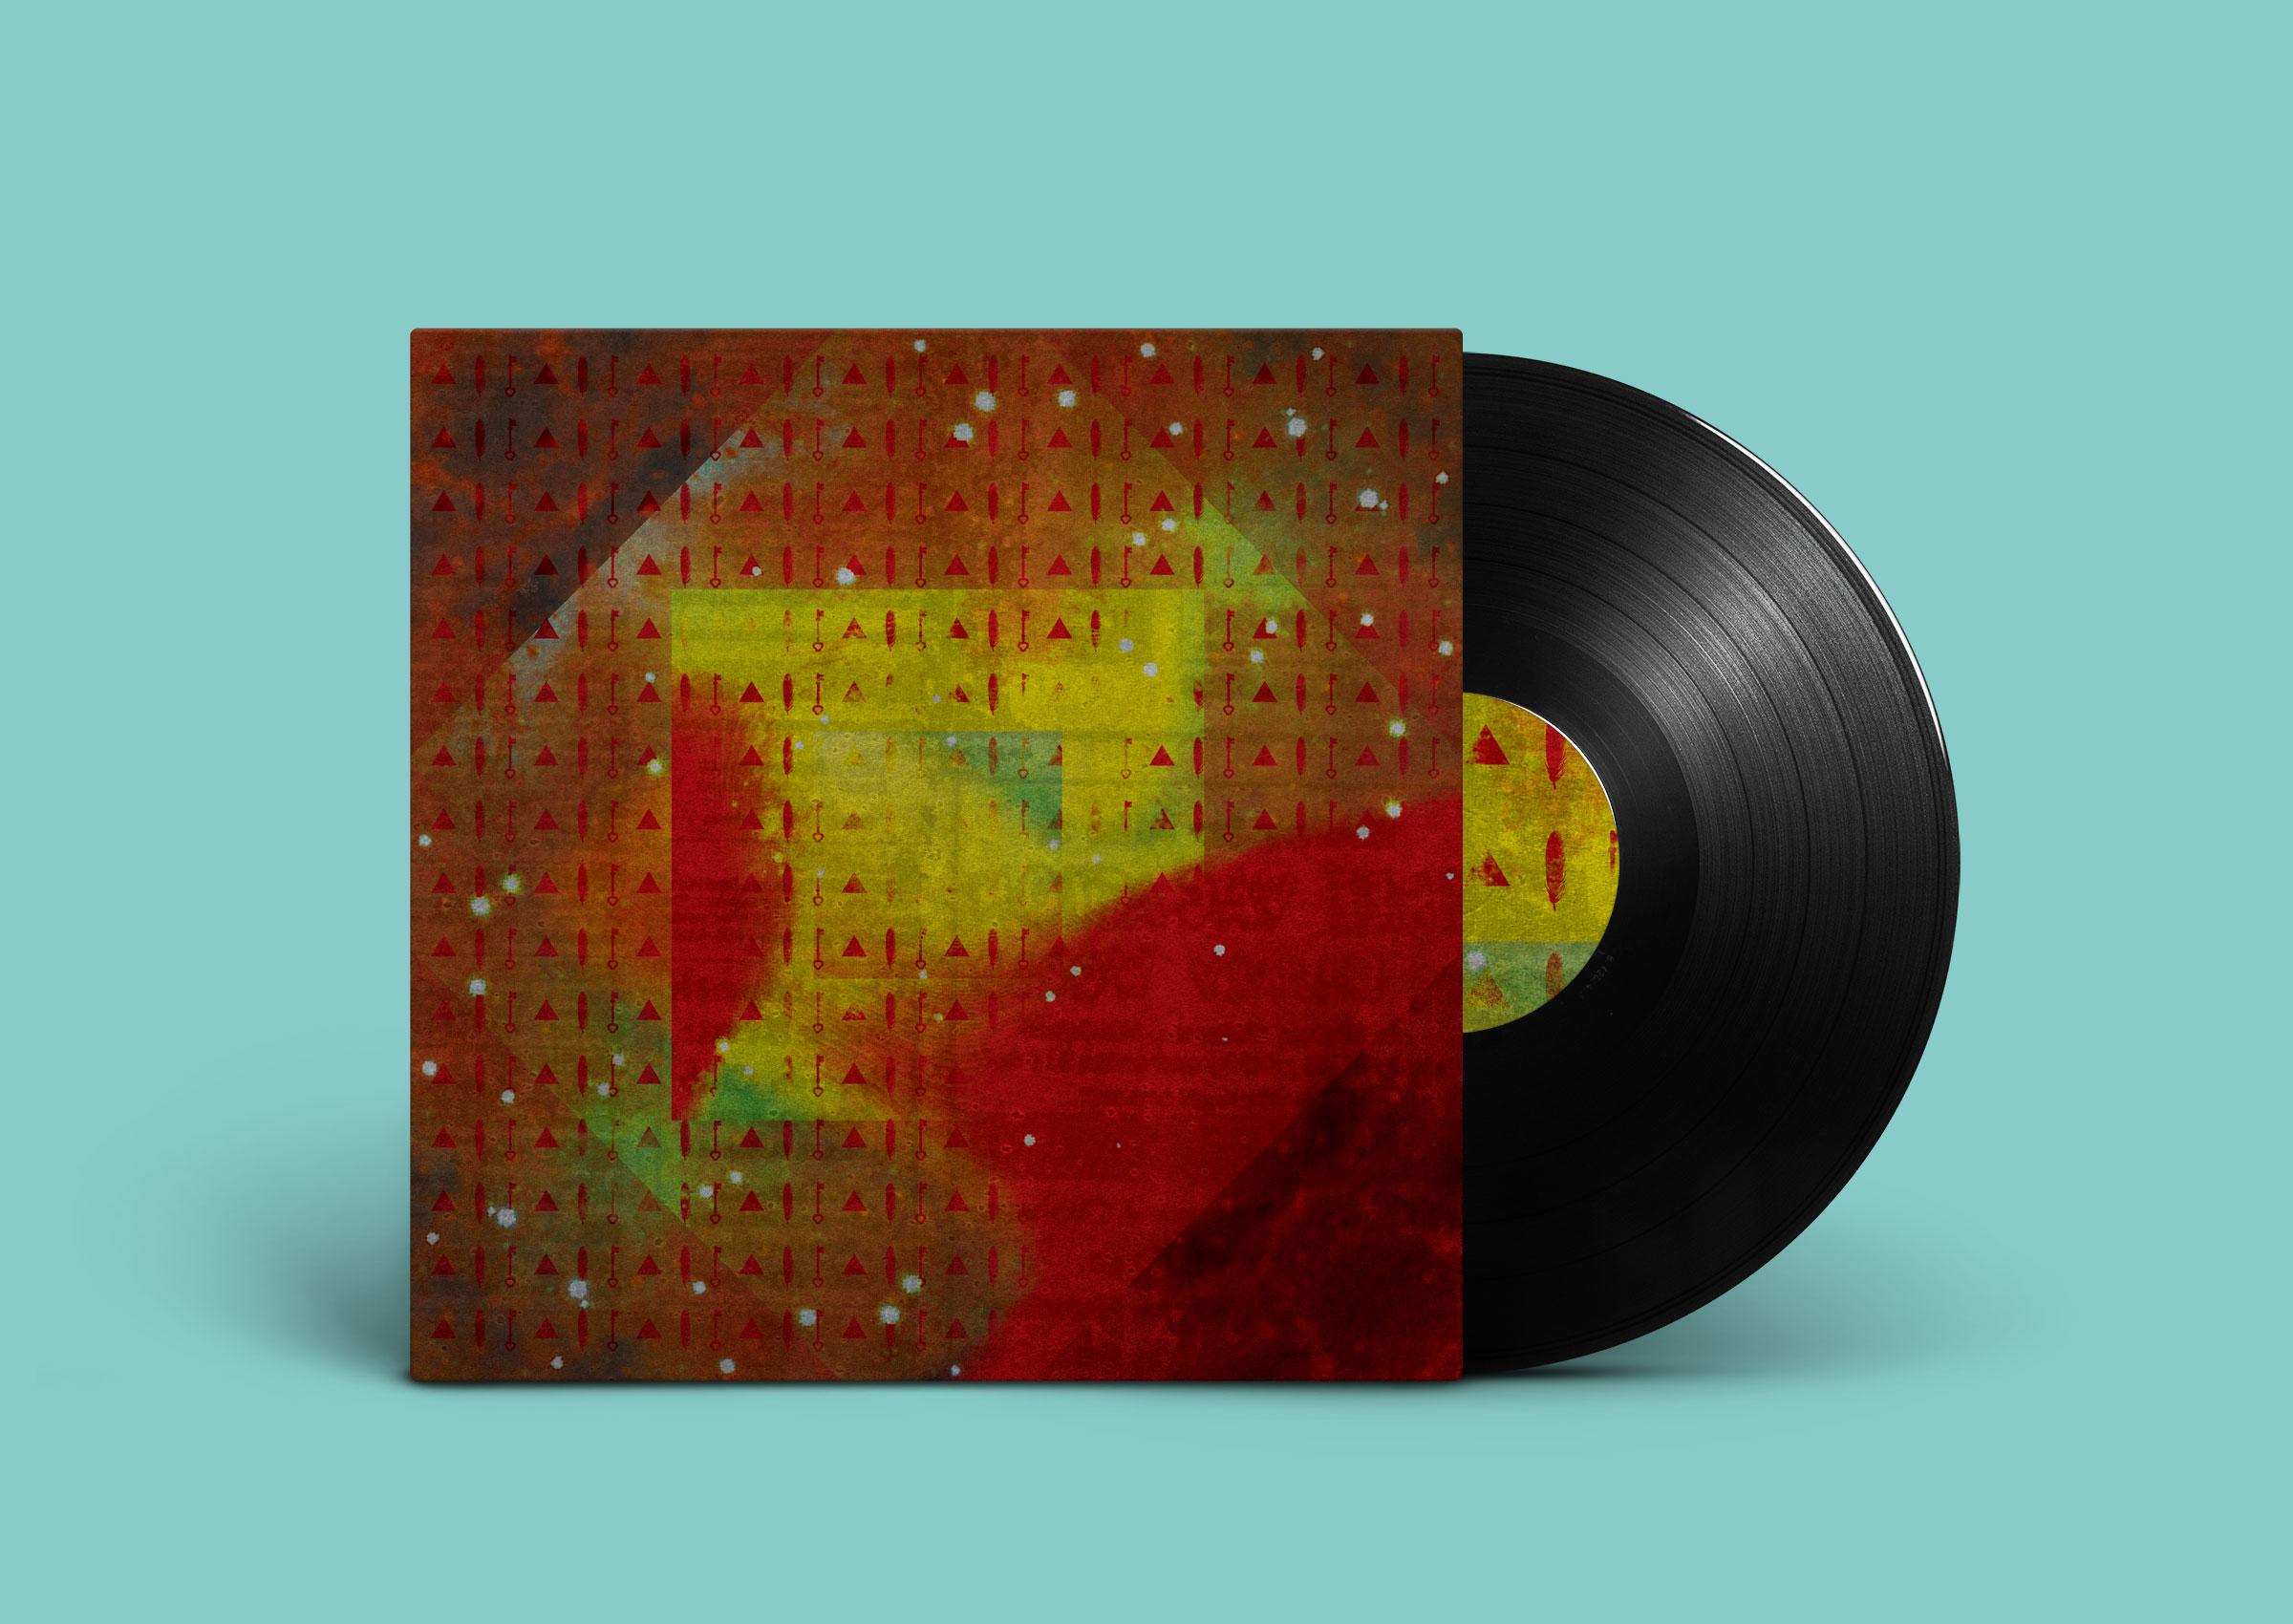 Vinyl-Record-PSD-MockUp-FMA02.jpg